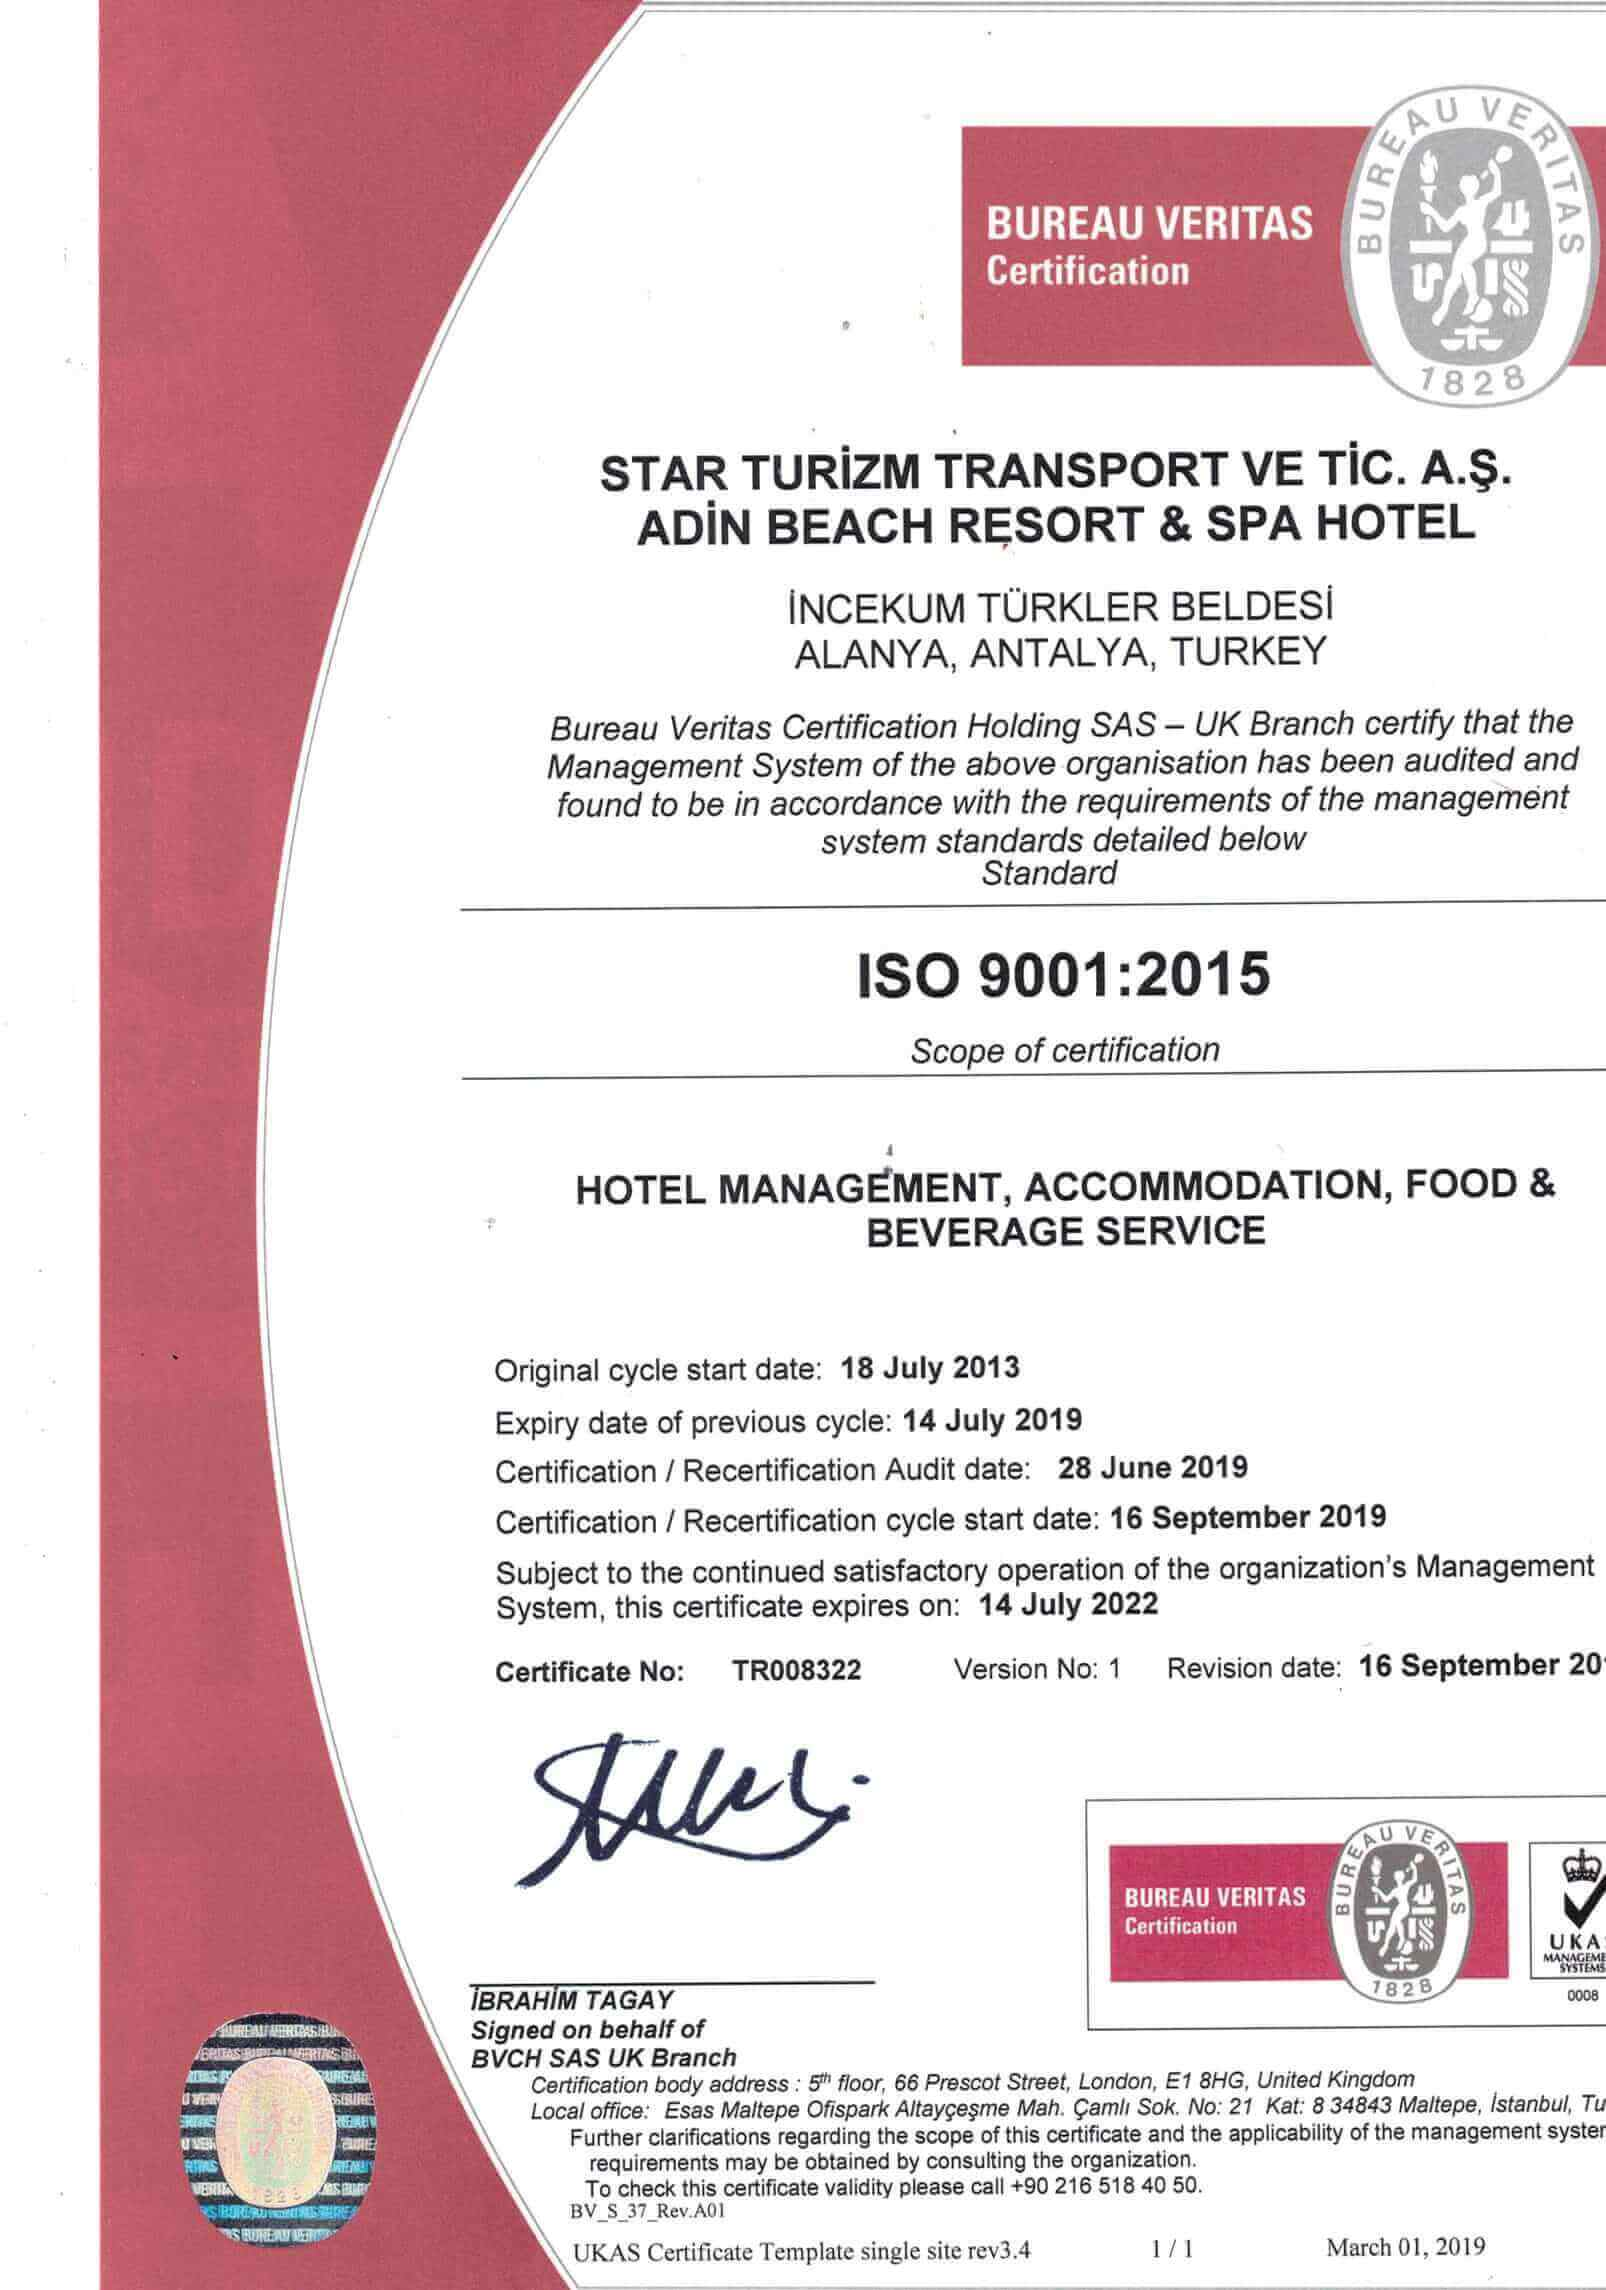 İSO 9001 belge 2. sayfa